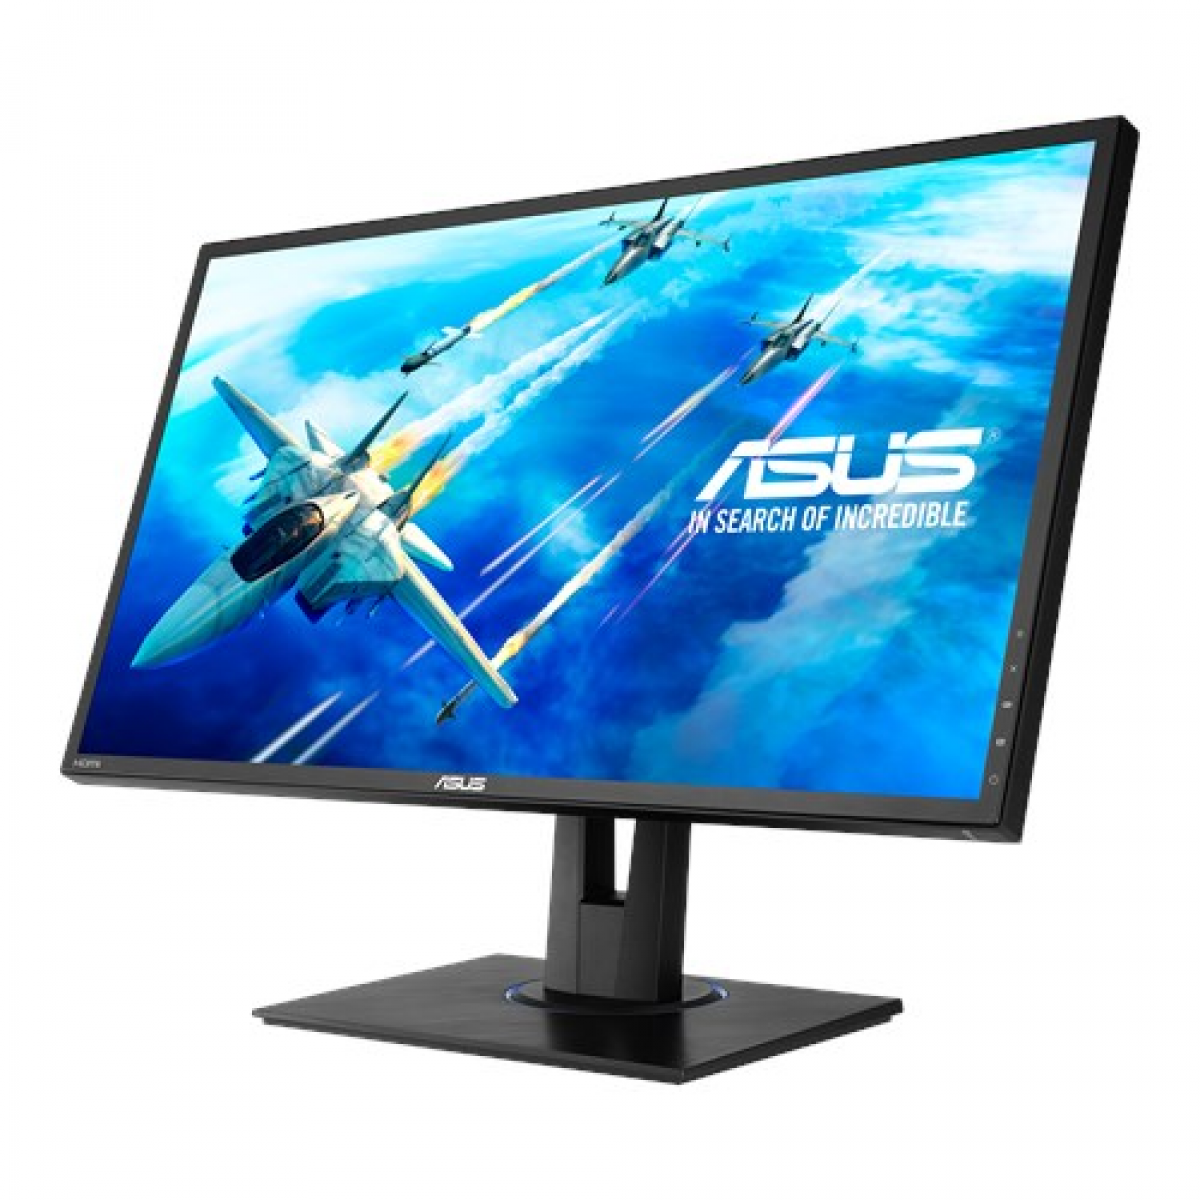 Monitor Gamer Asus 24 Pol, Full HD, 1ms, AMD FreeSync, VG245HE